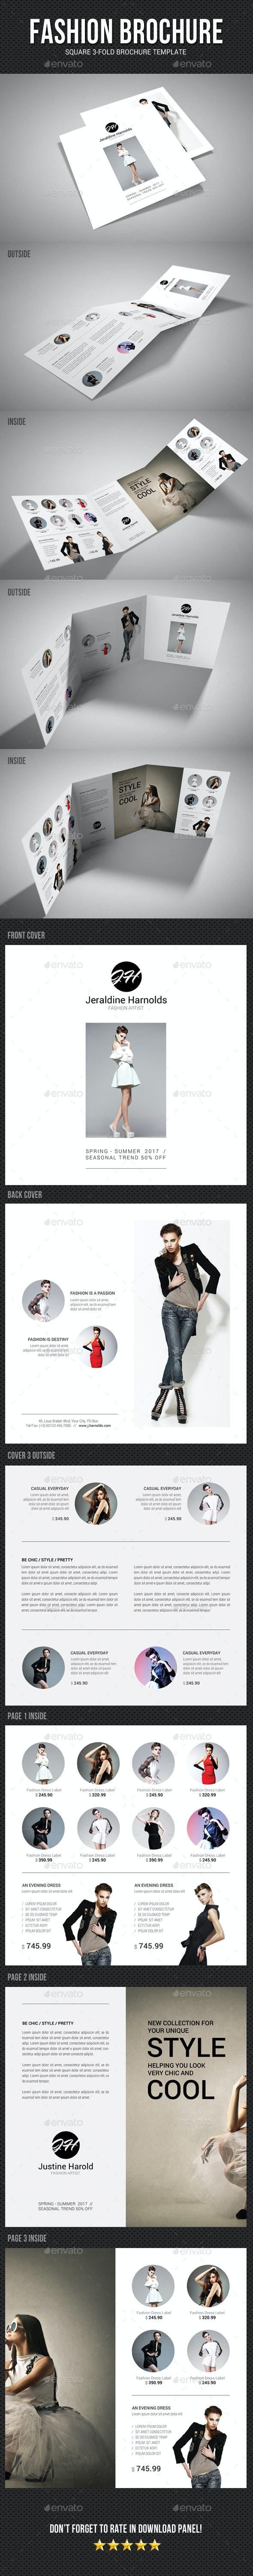 Square Tri-Fold Fashion Brochure 02 - Catalogs Brochures